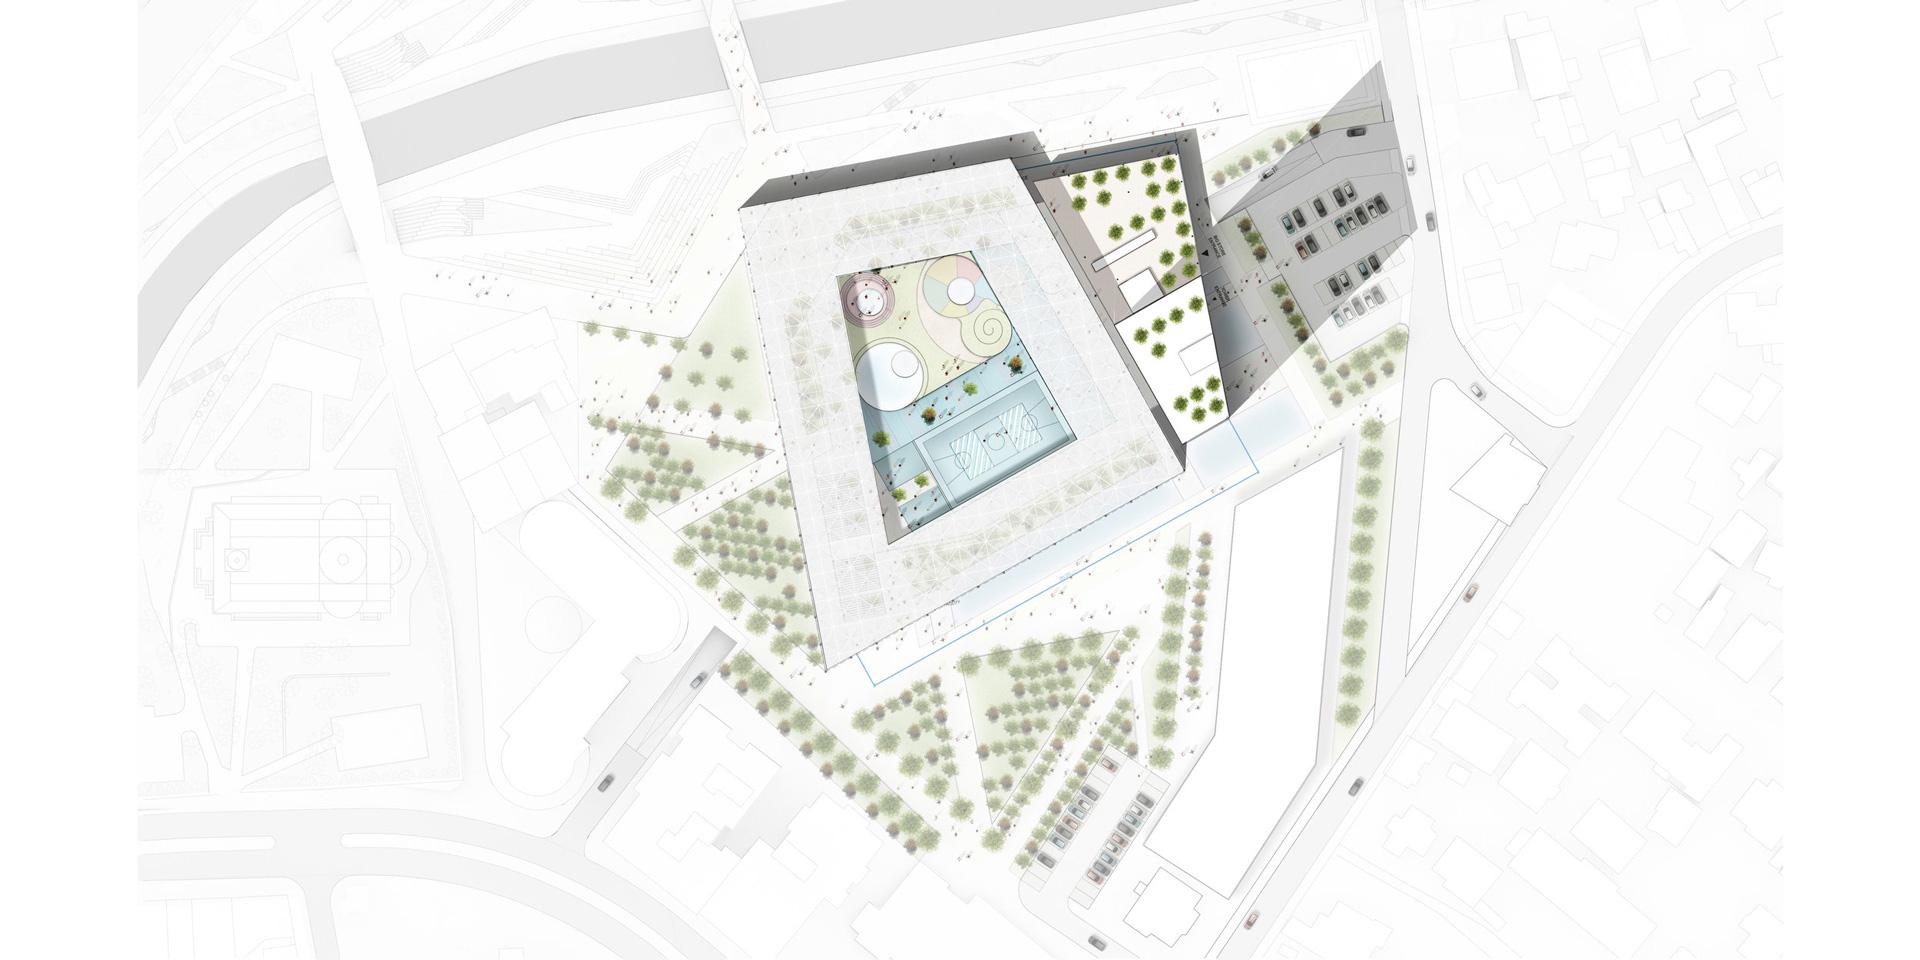 atelier_cappochin_architecture_masterplan